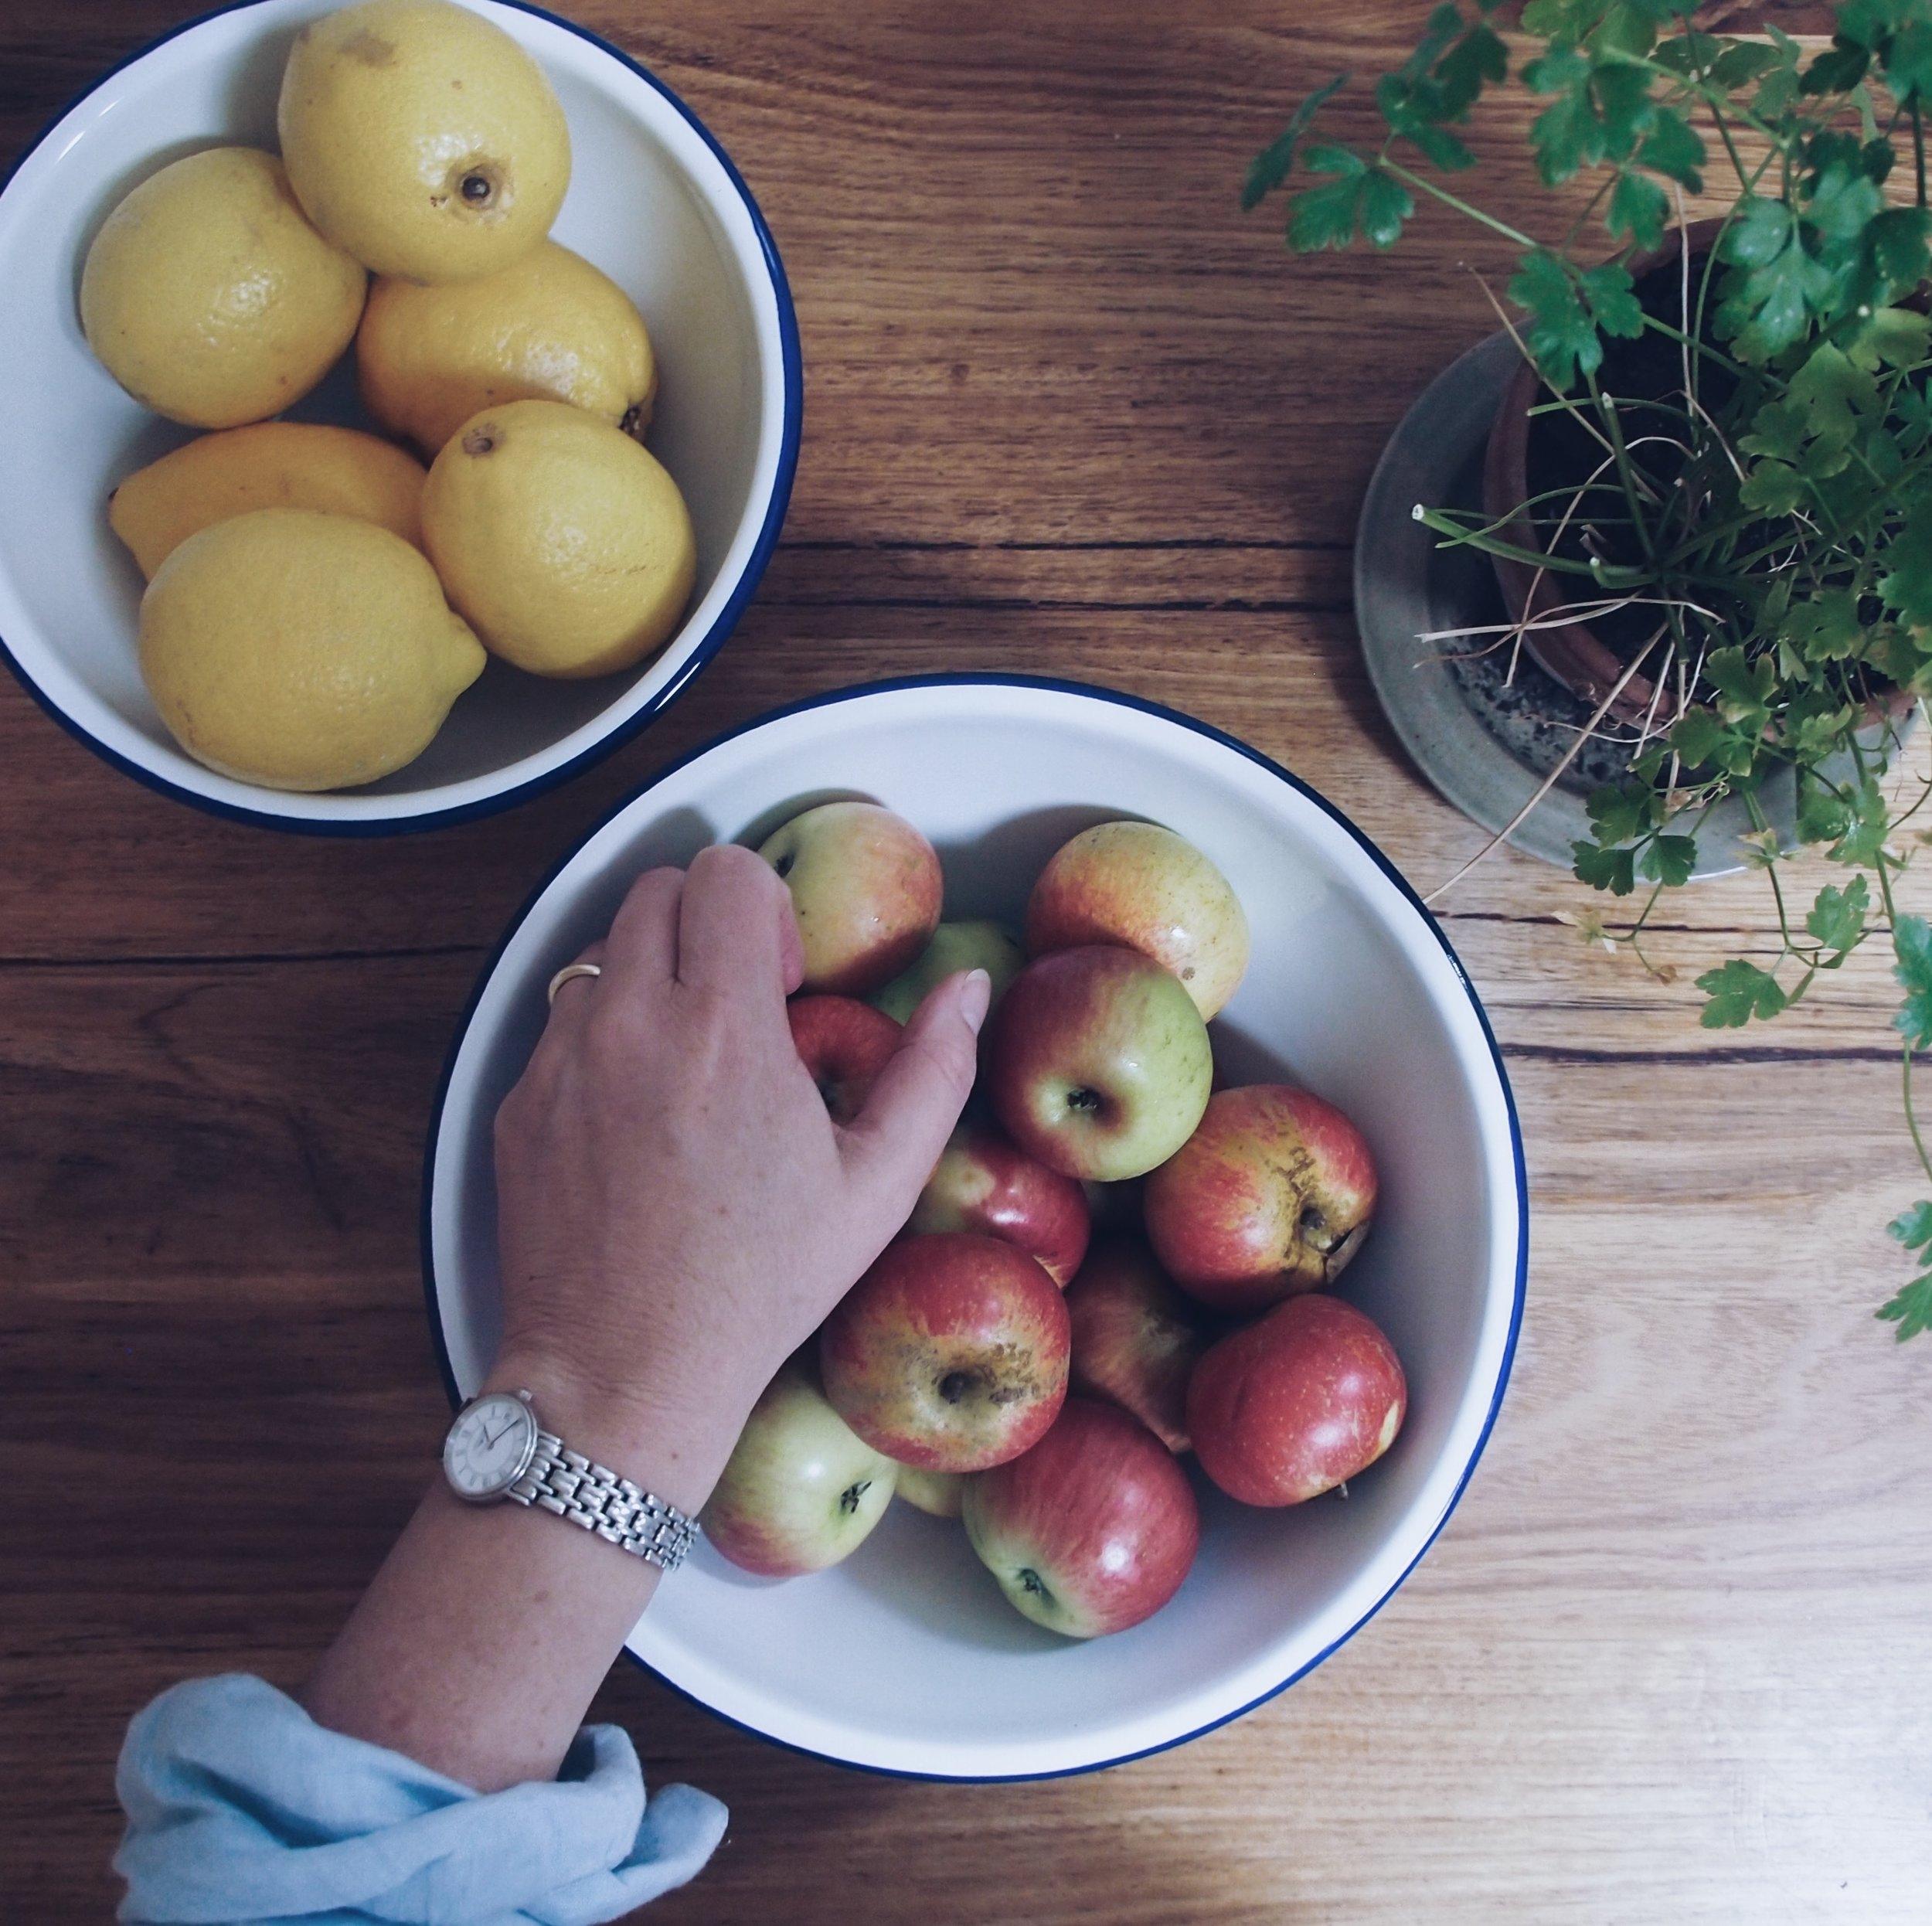 hygge-apples.jpg